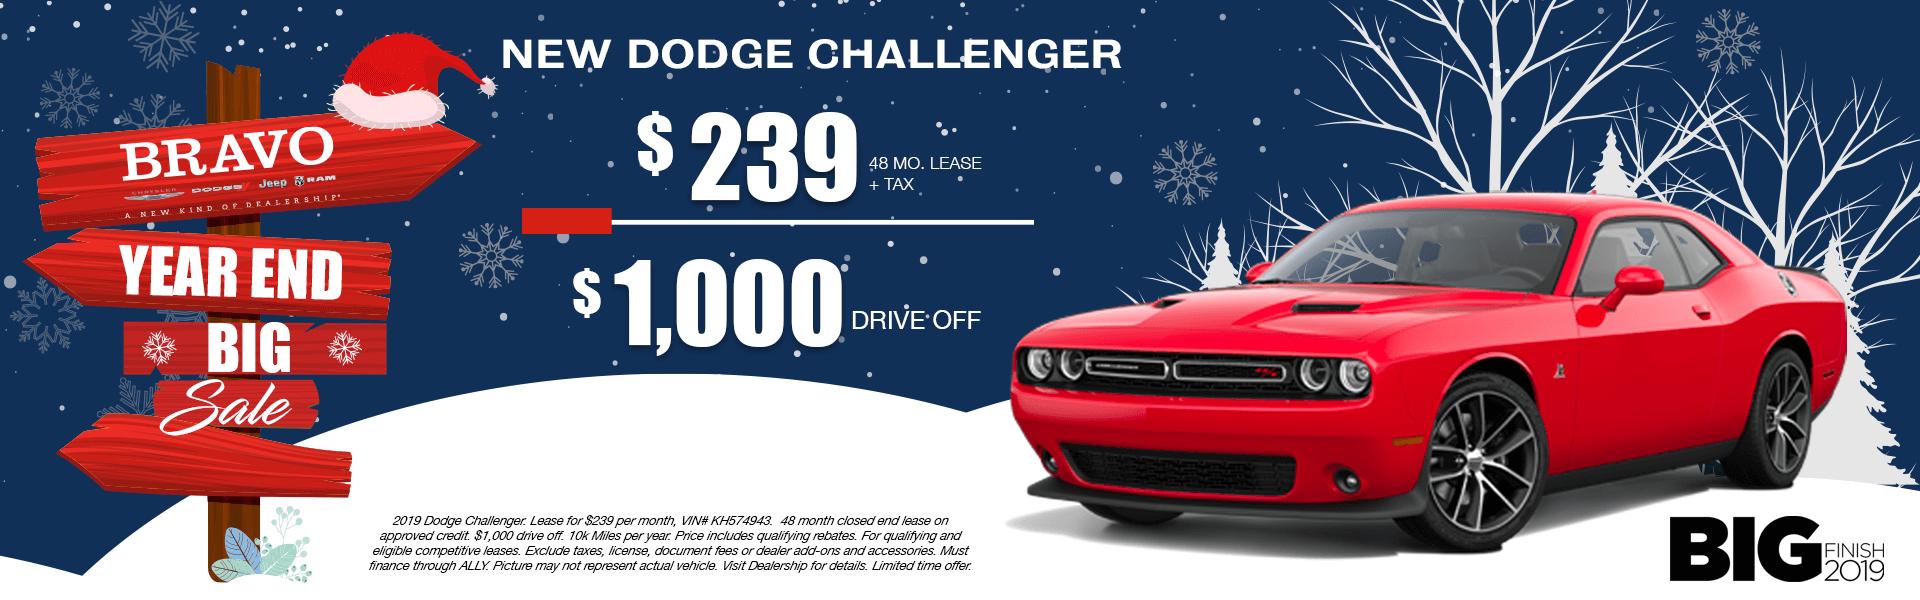 Dodge Challenger-Lease